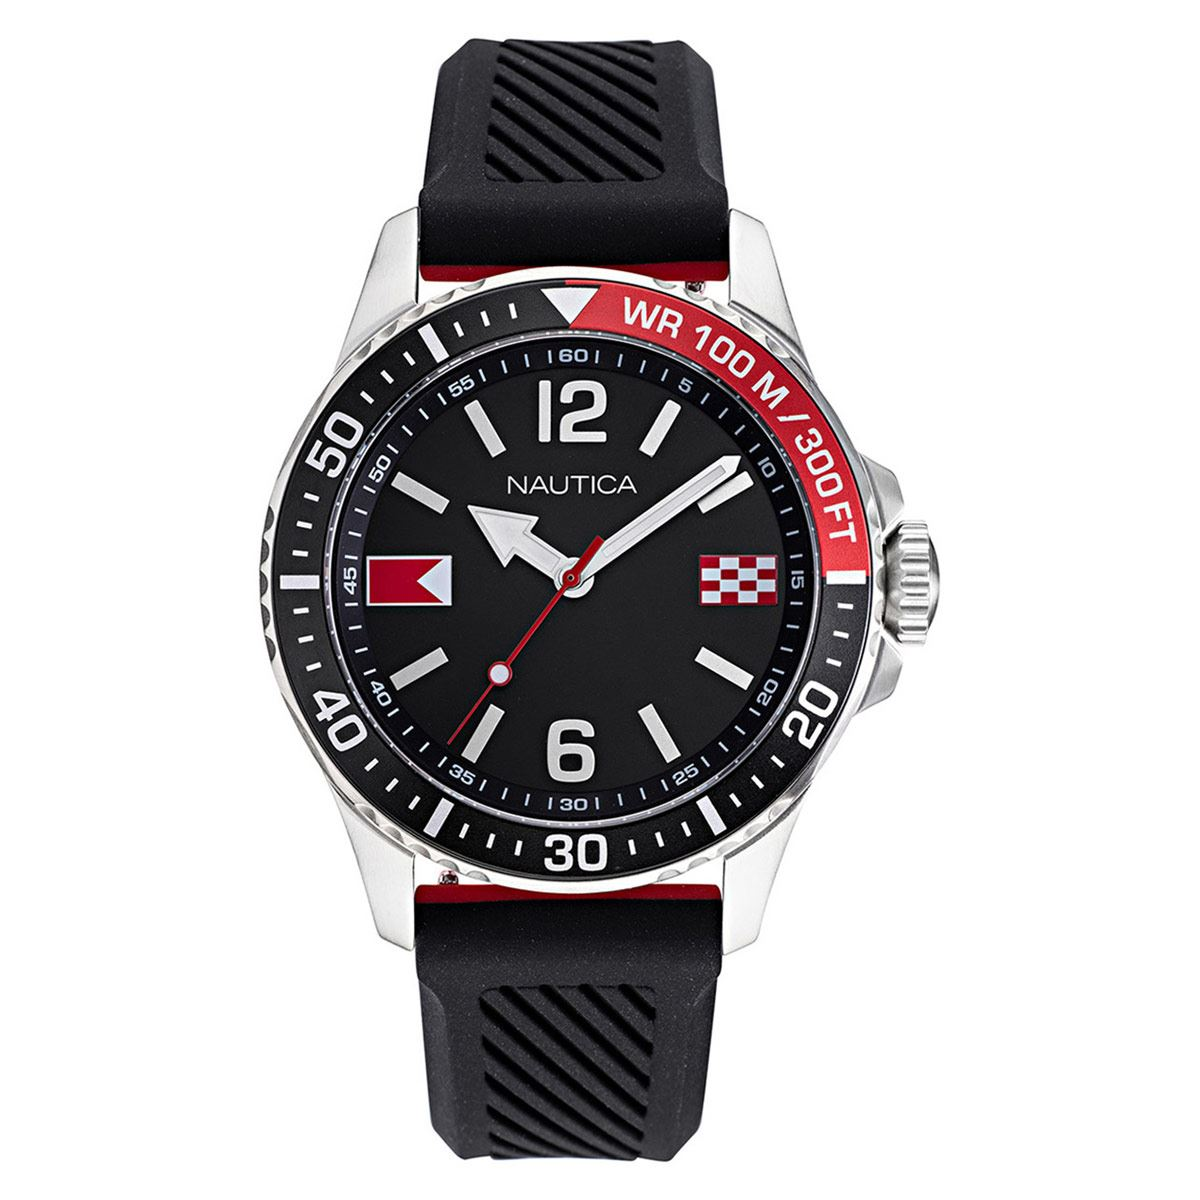 Reloj Nautica Dos Correas NAPFRB926 Negro